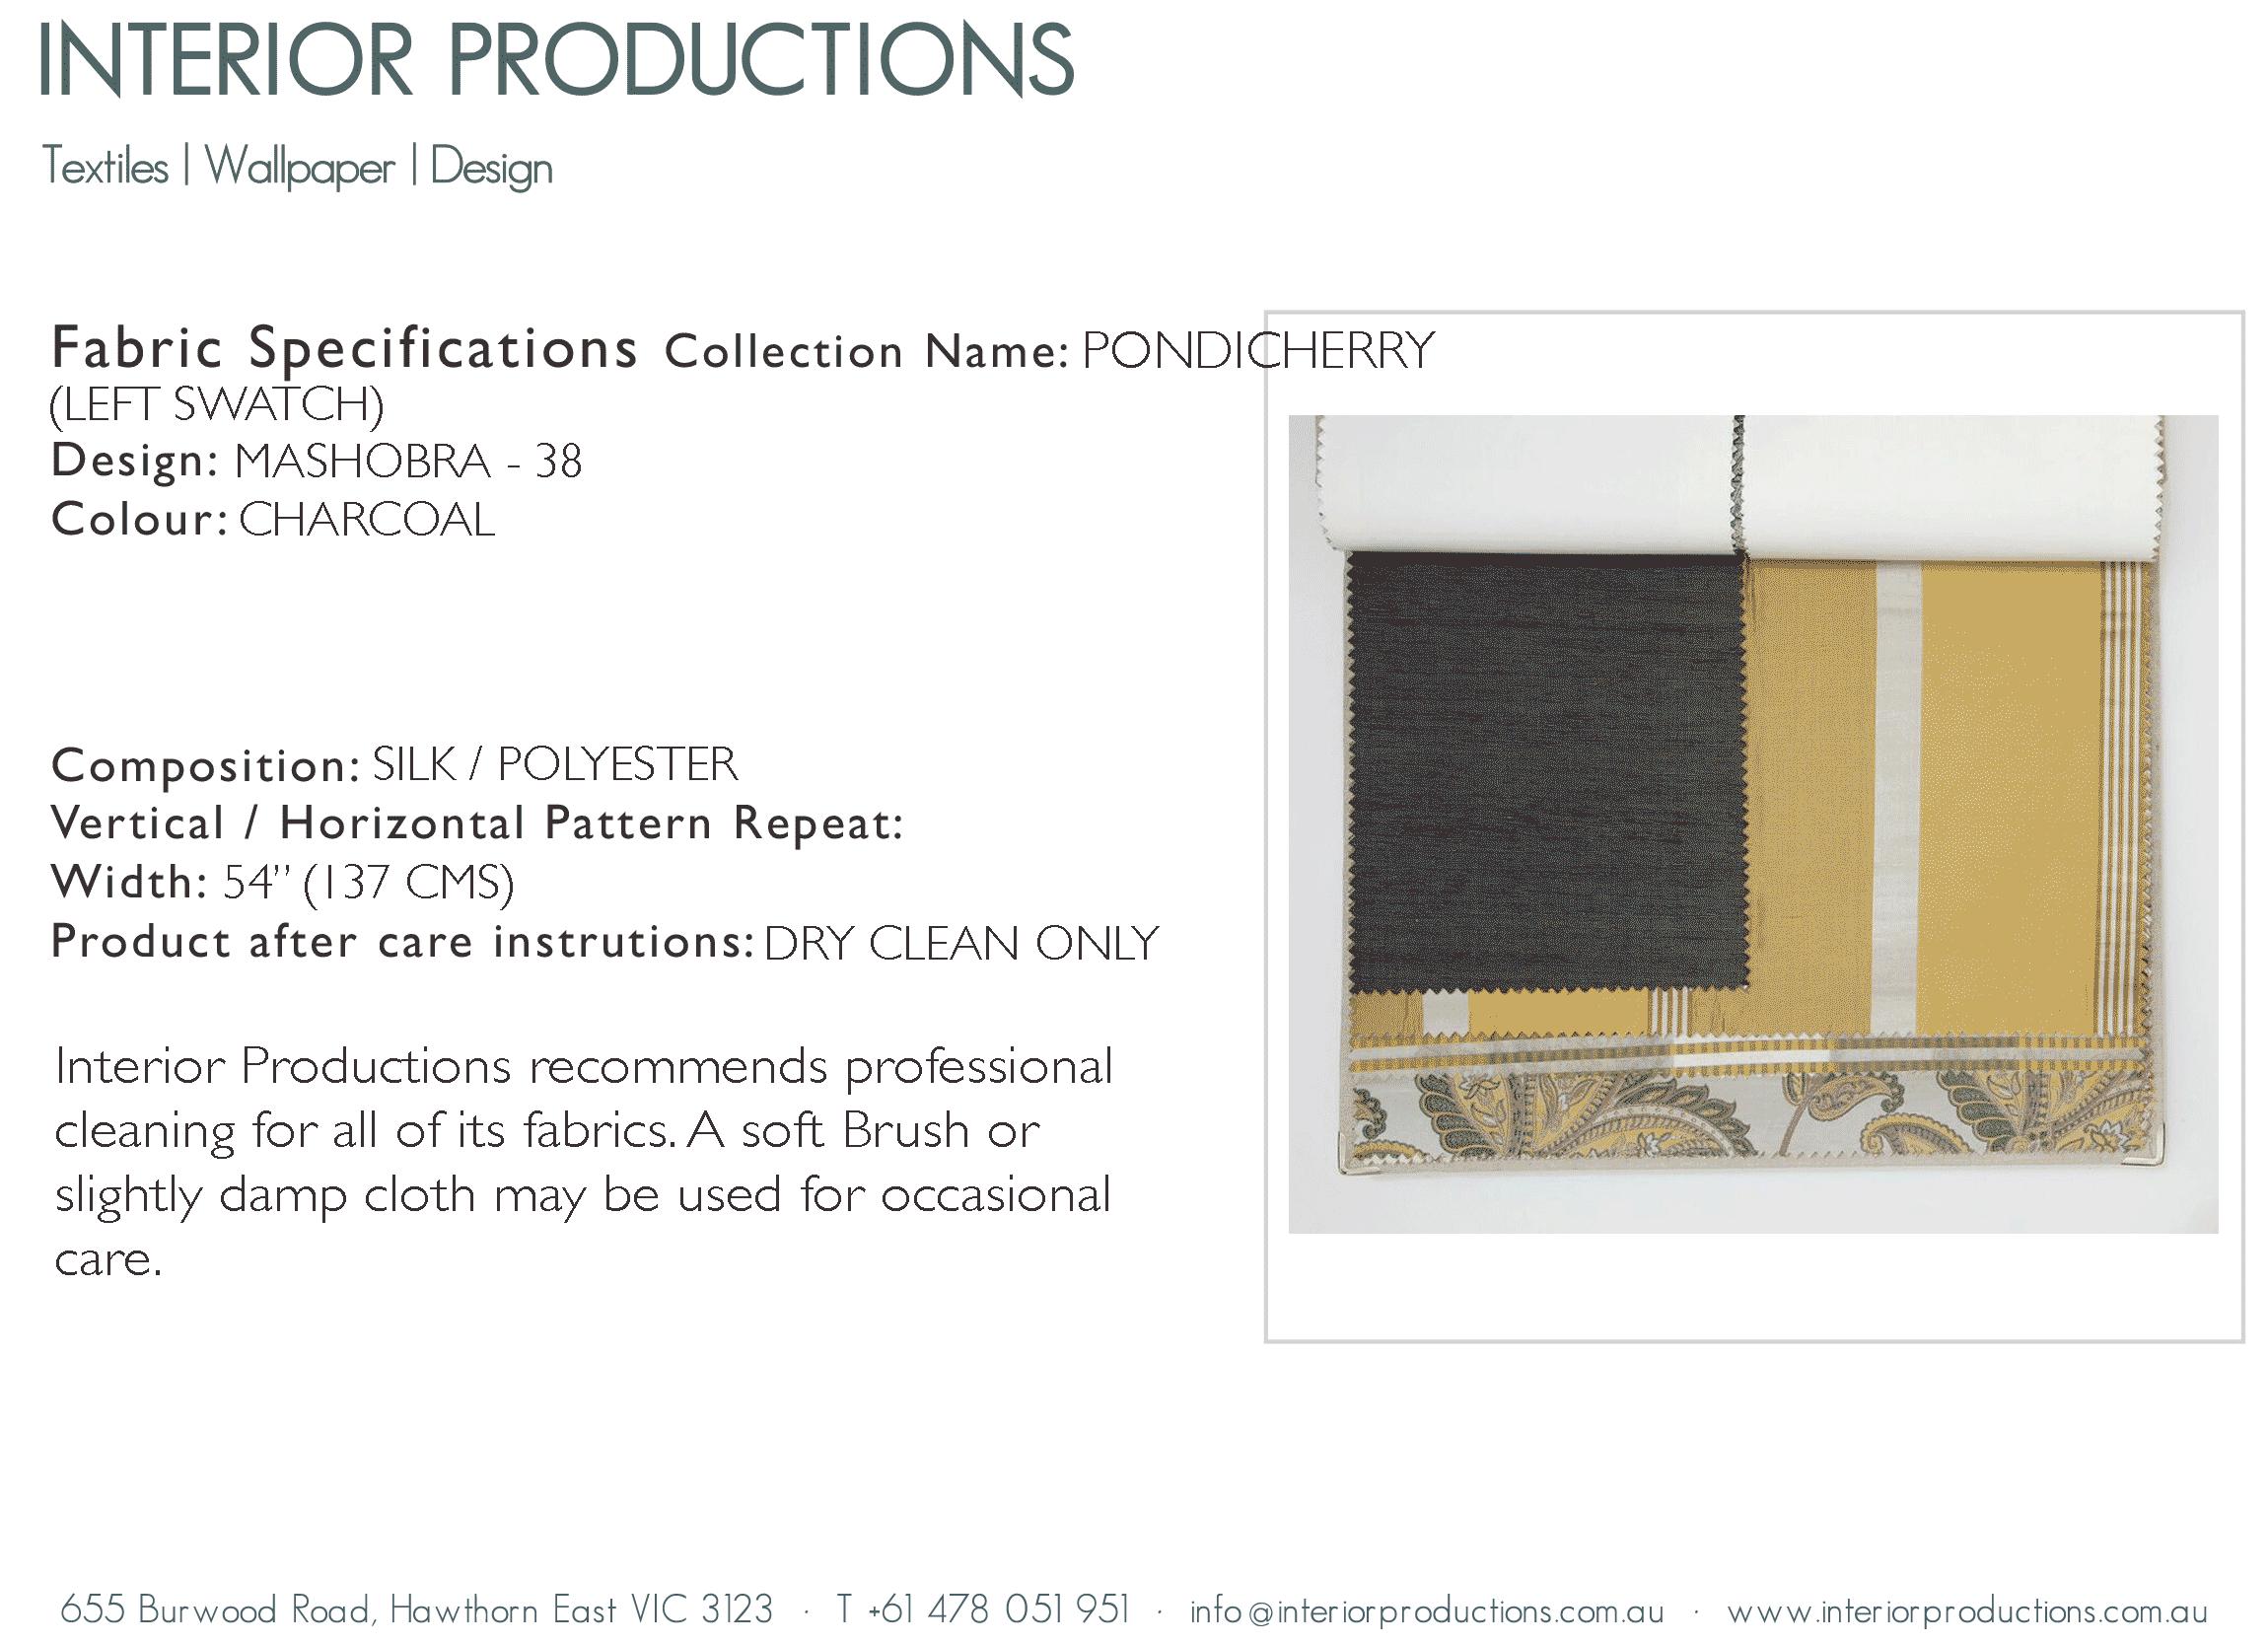 interior_productions_MASHOBRA-38---CHARCOAL